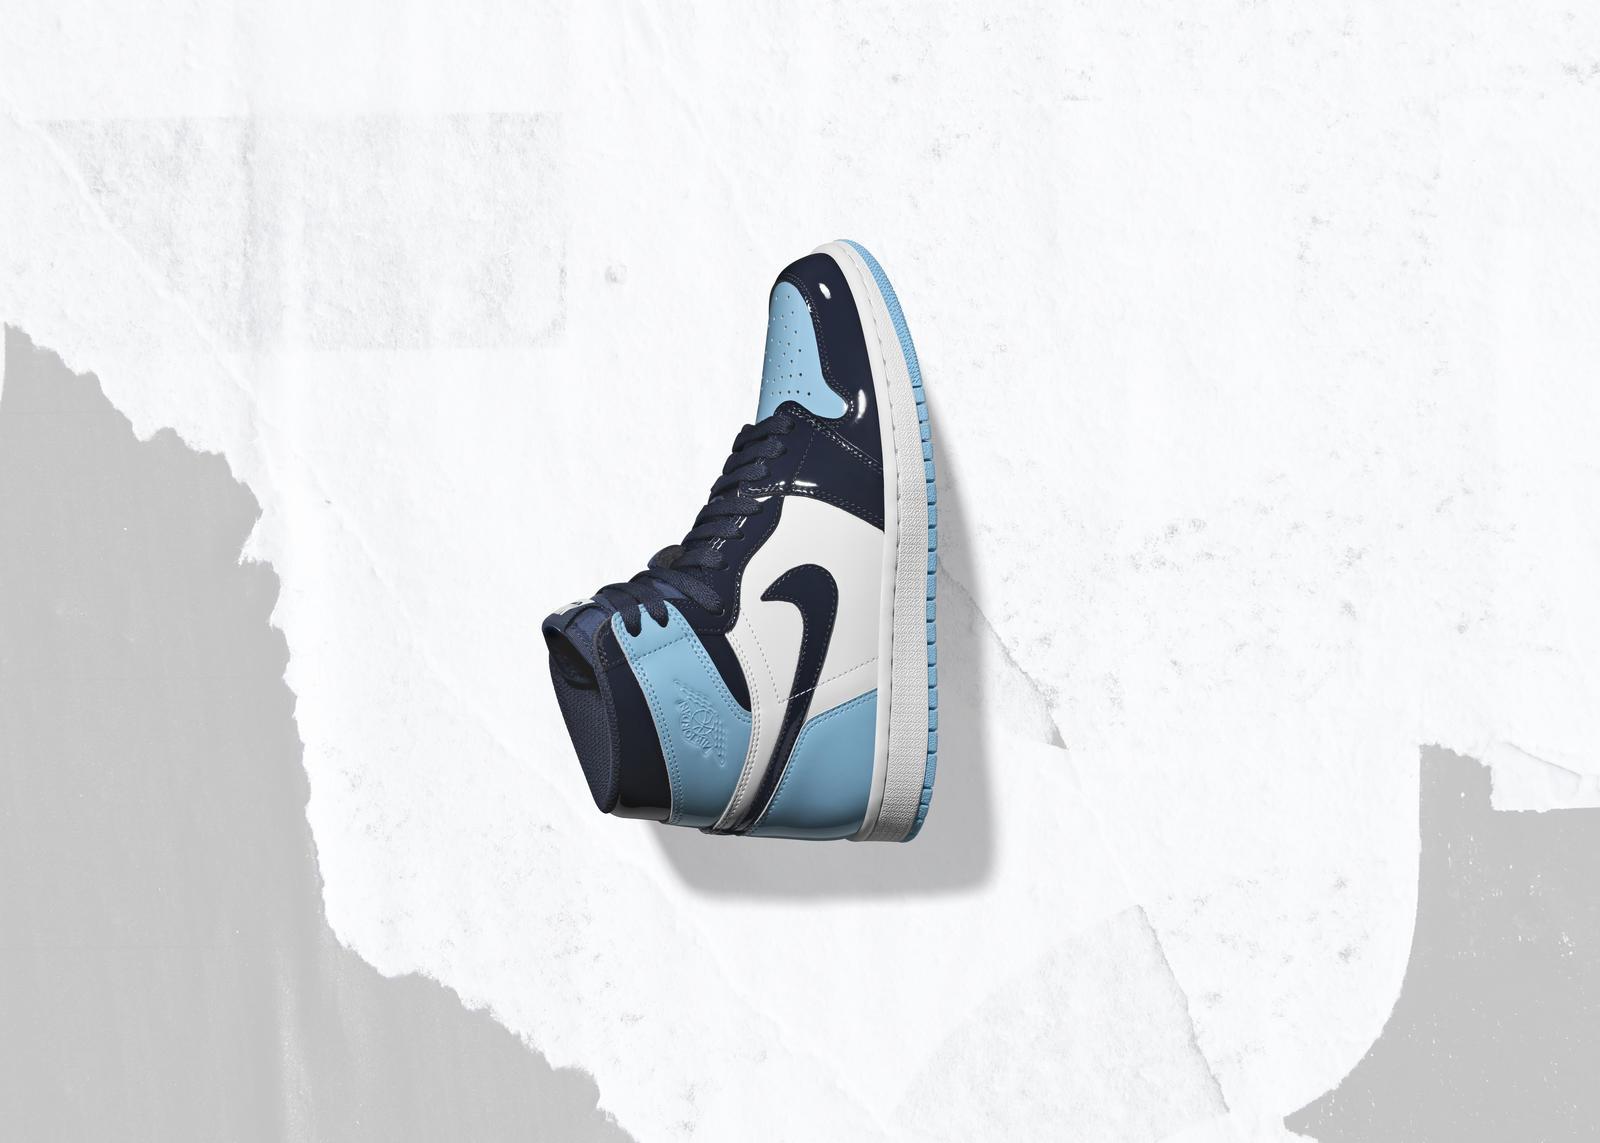 Nike and Jordan Brand's 2019 NBA All